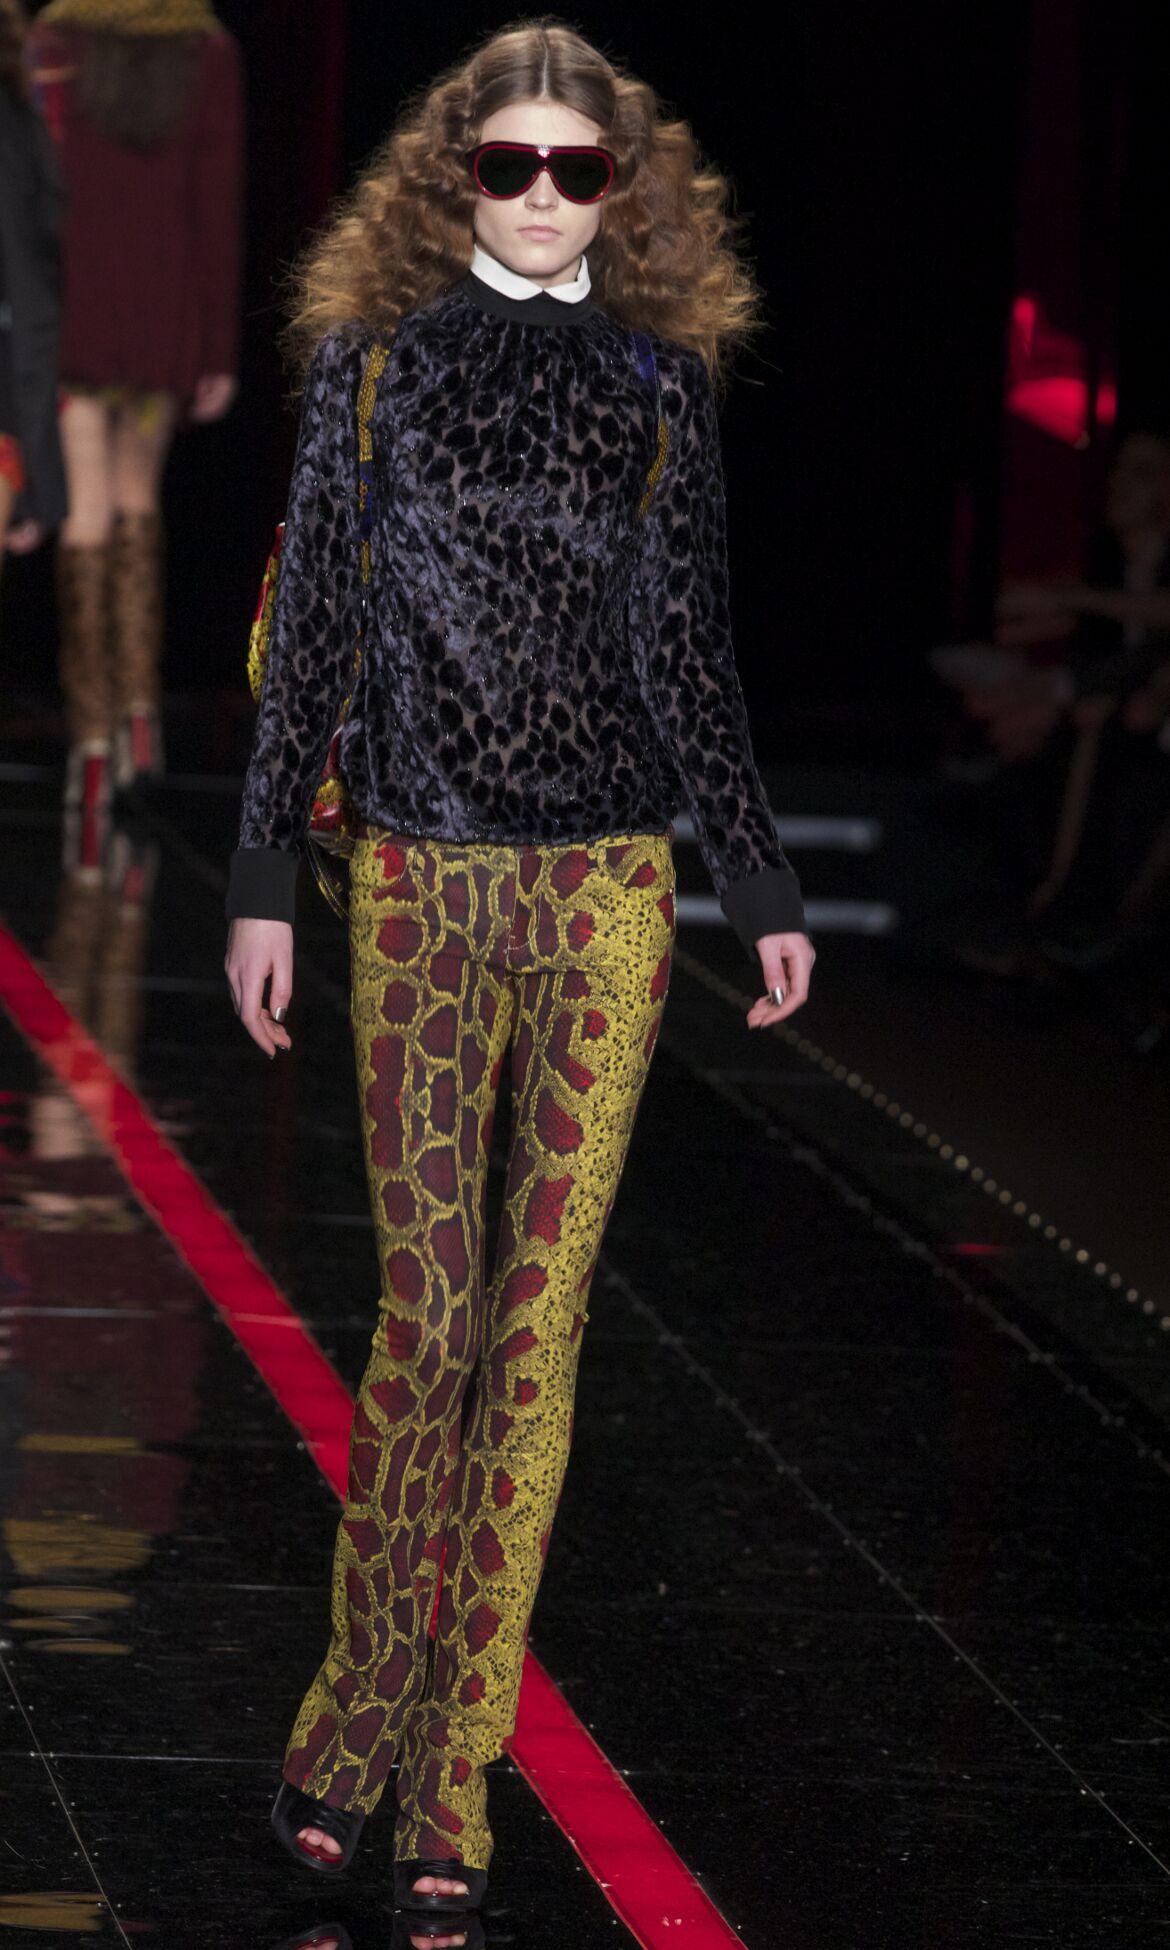 2013 2014 Just Cavalli Fashion Show FW